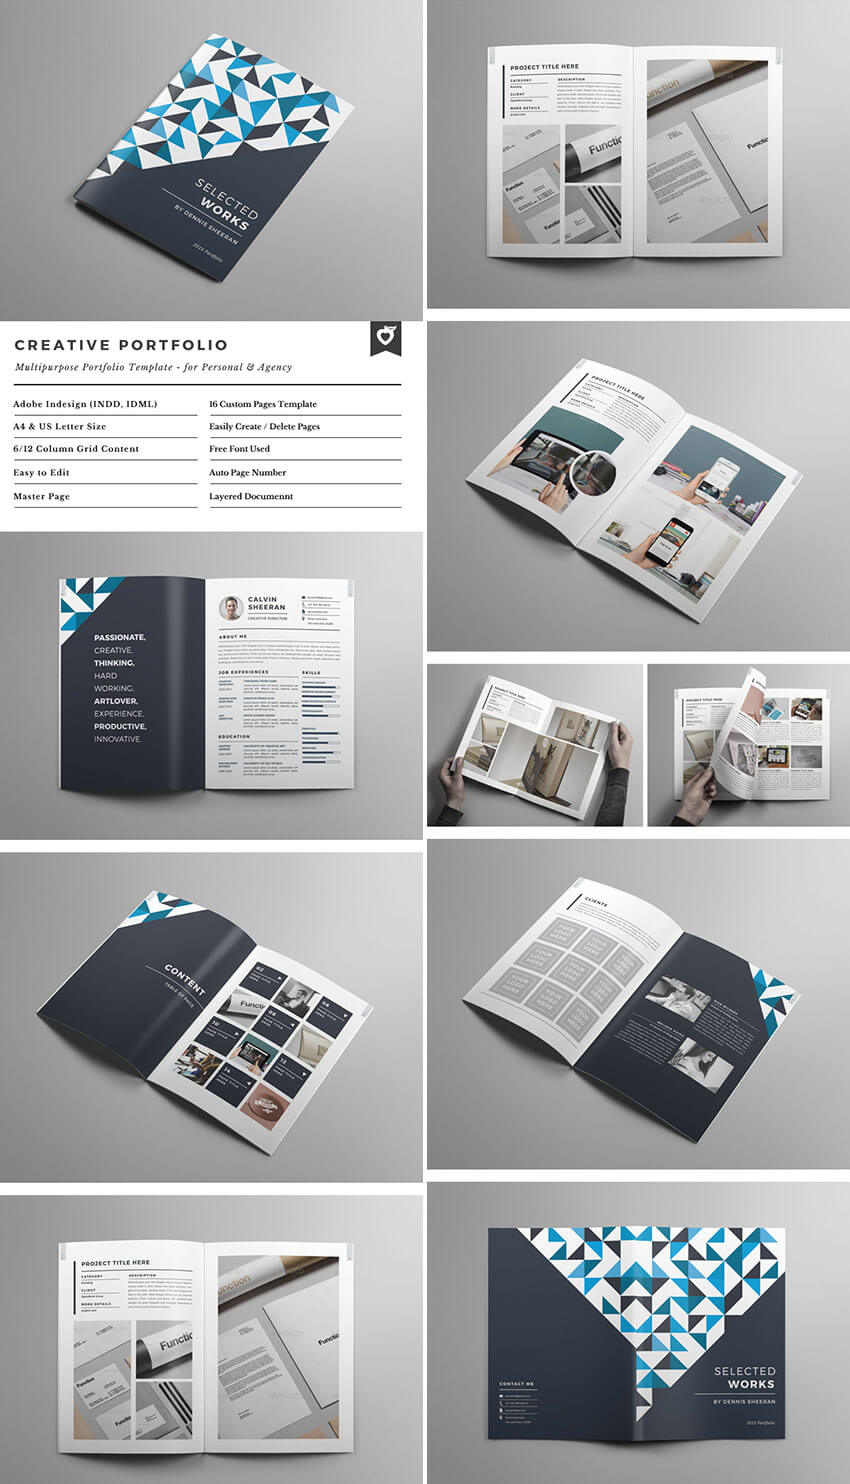 30 Best Indesign Brochure Templates – Creative Business With Brochure Template Indesign Free Download